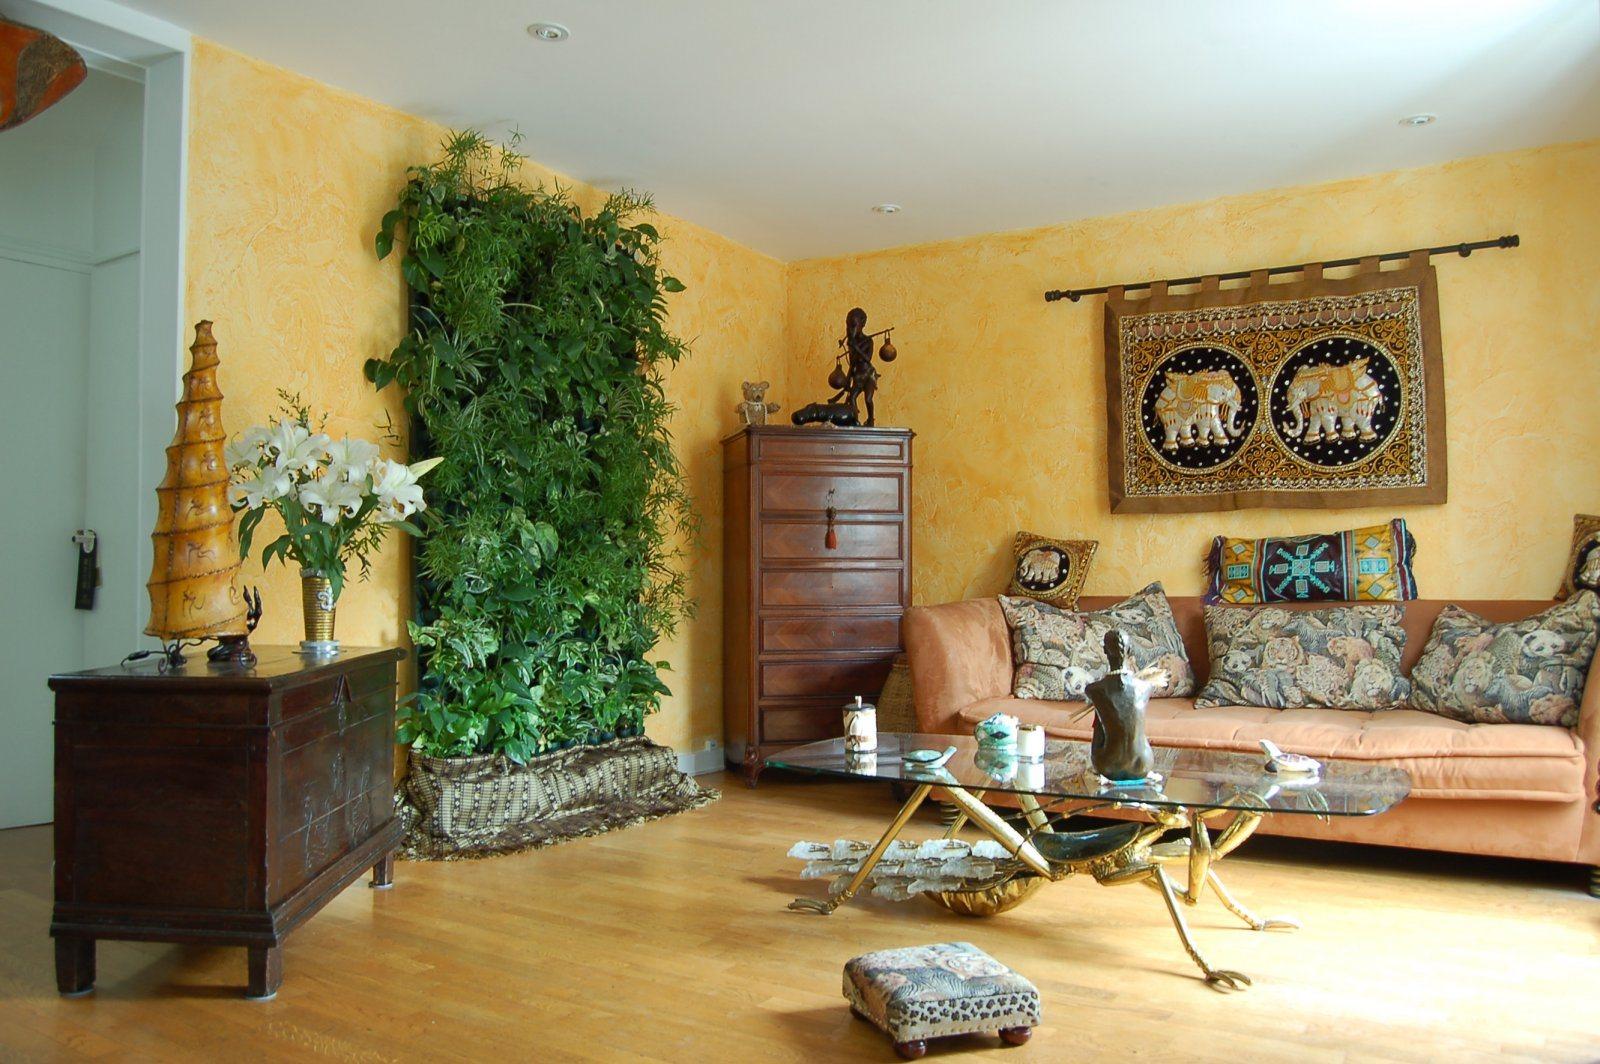 Plantas de interior decora o da casa Plantas de interior toxicas